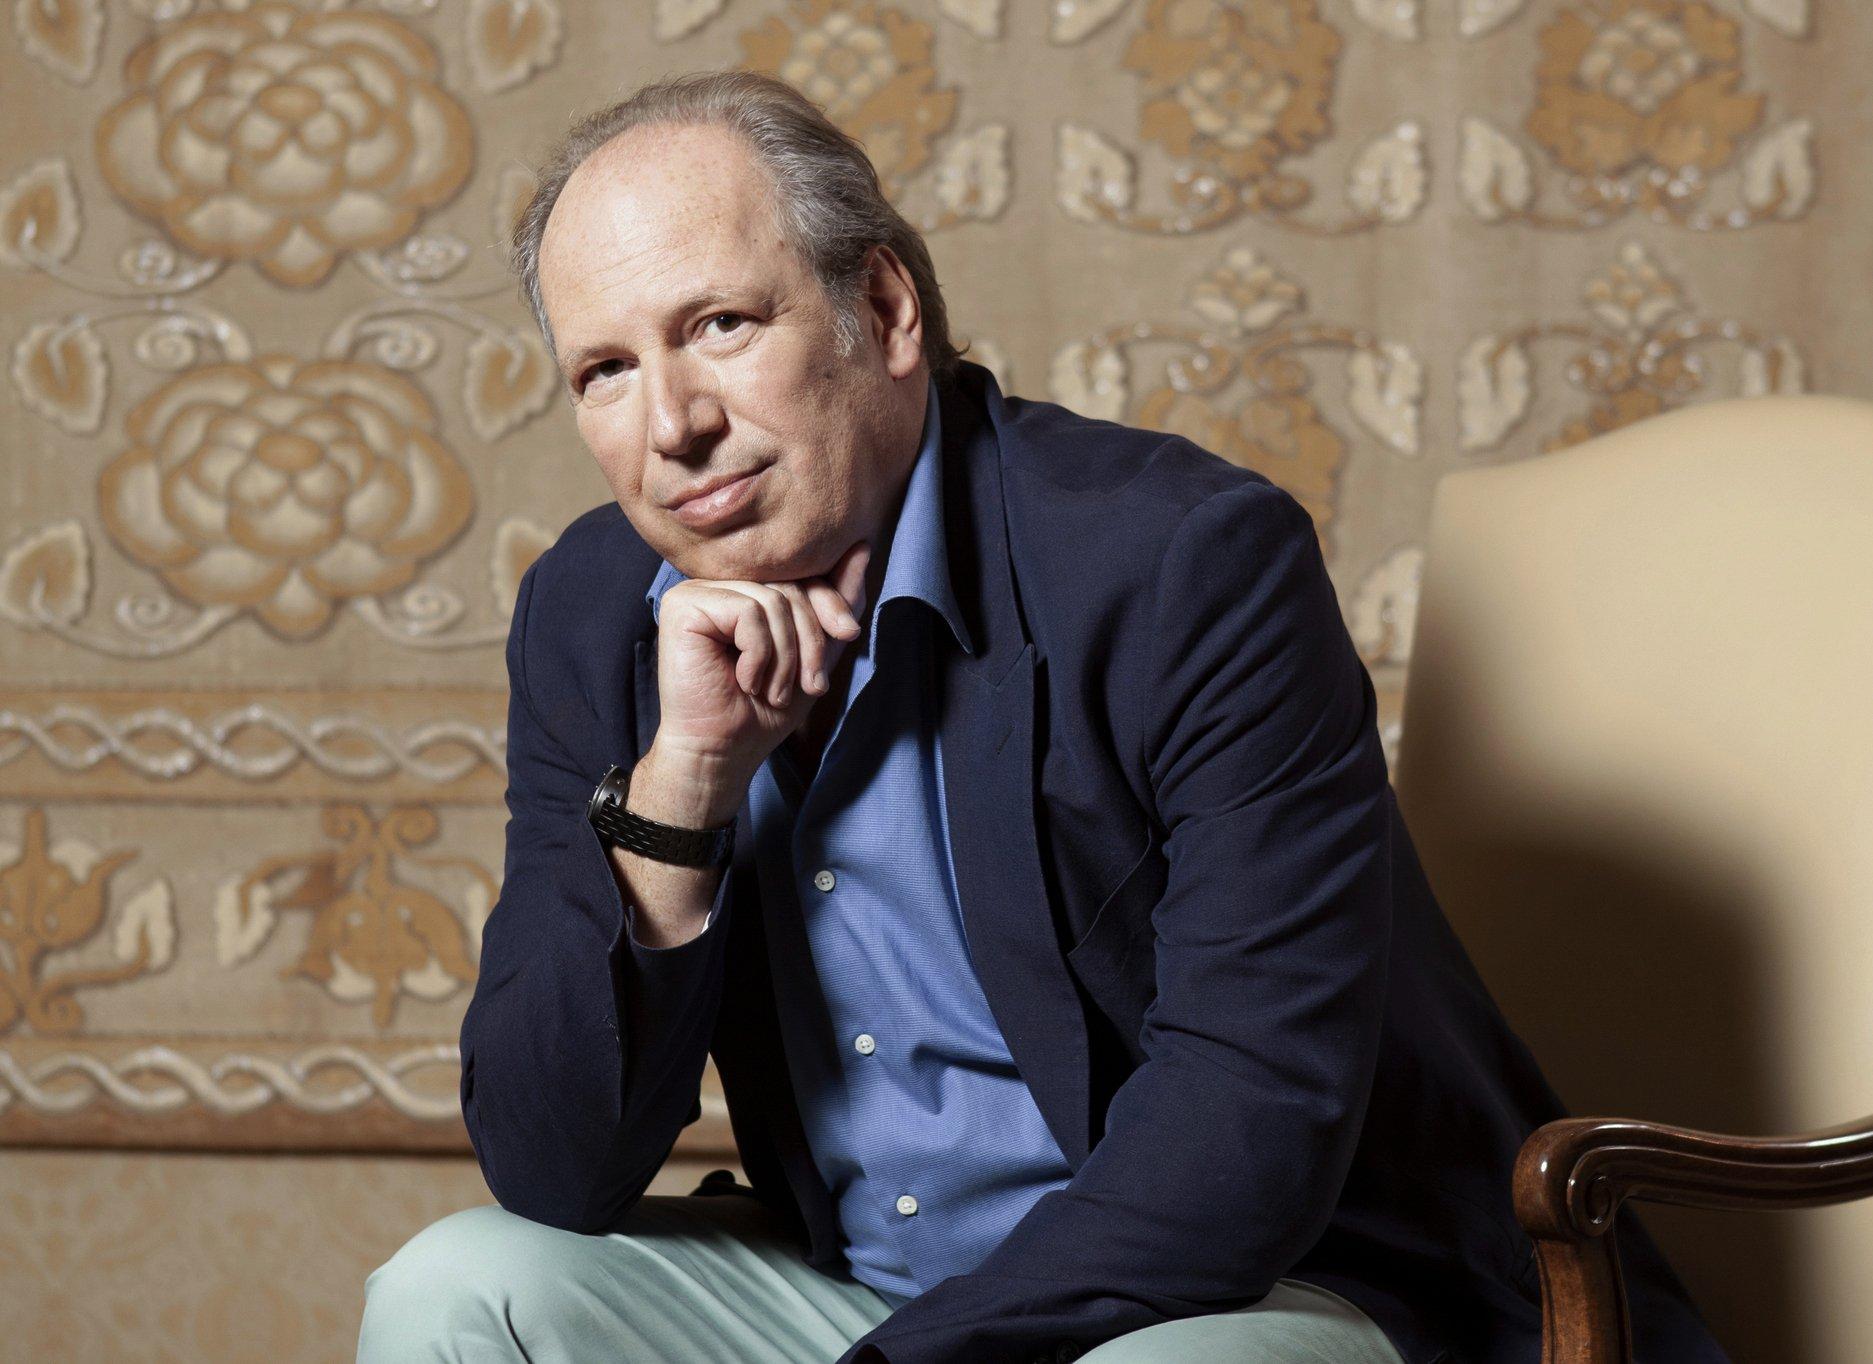 'Lion King' composer Hans Zimmer finds circle of life